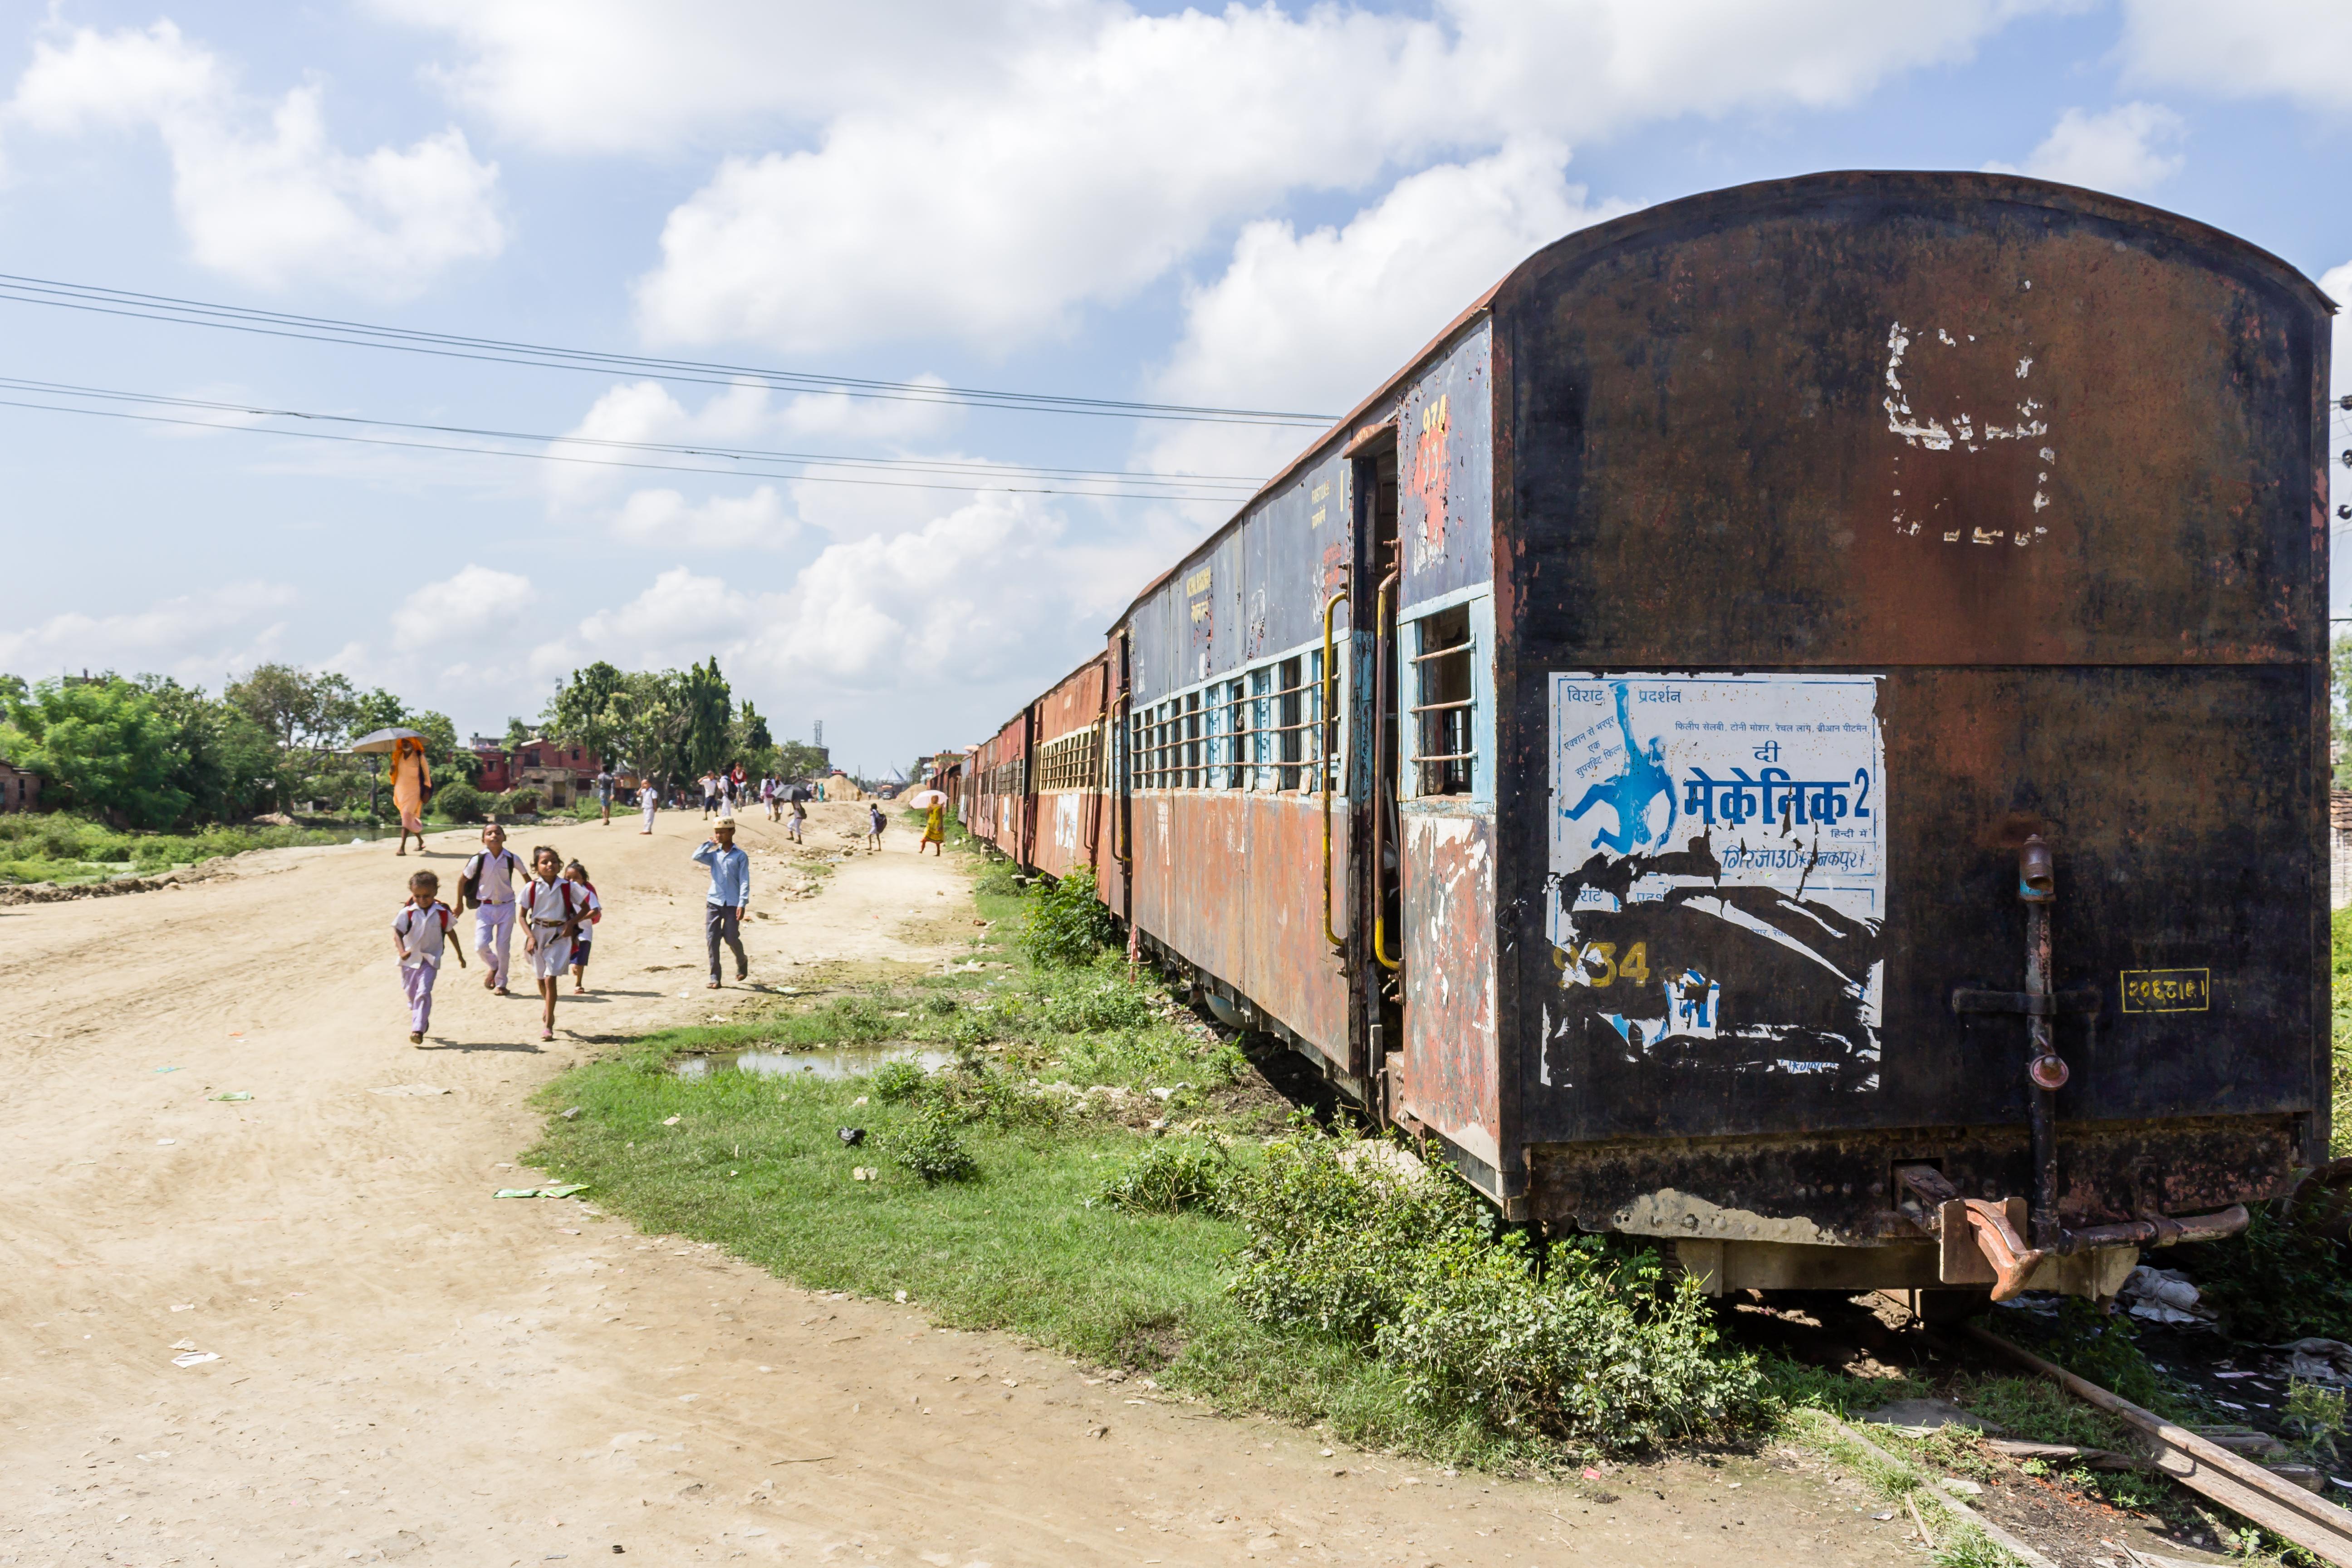 File:Abandoned Train at Janakpur station, Nepal Railways